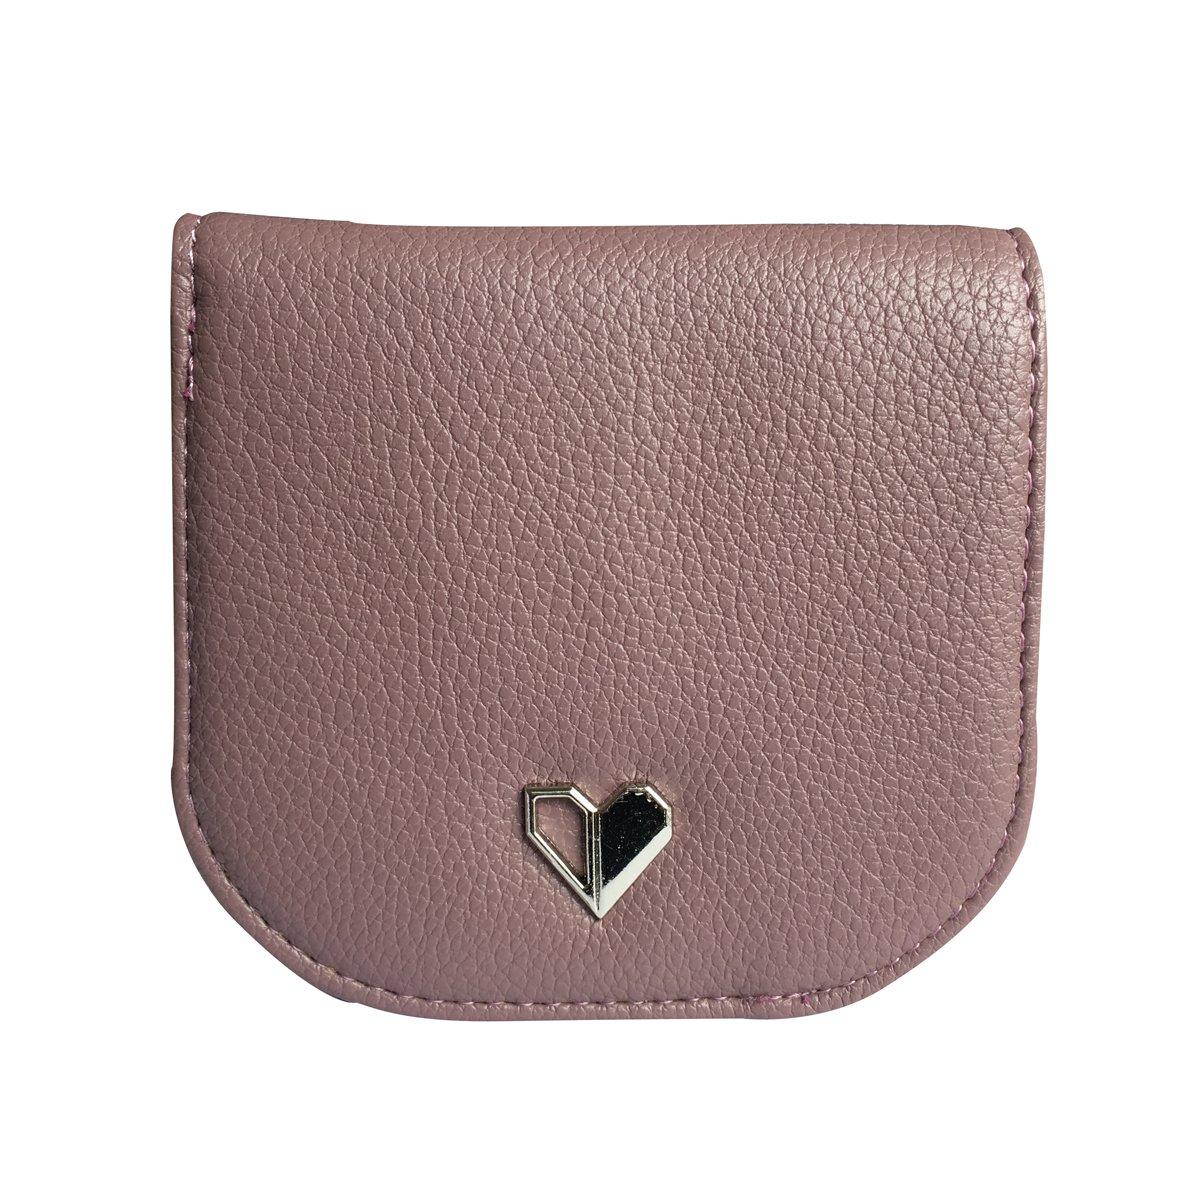 HeySun Fashion Compact Wallet Purse Simple Card Holder Lightweight Snap Money Clip for Women (Lavender)